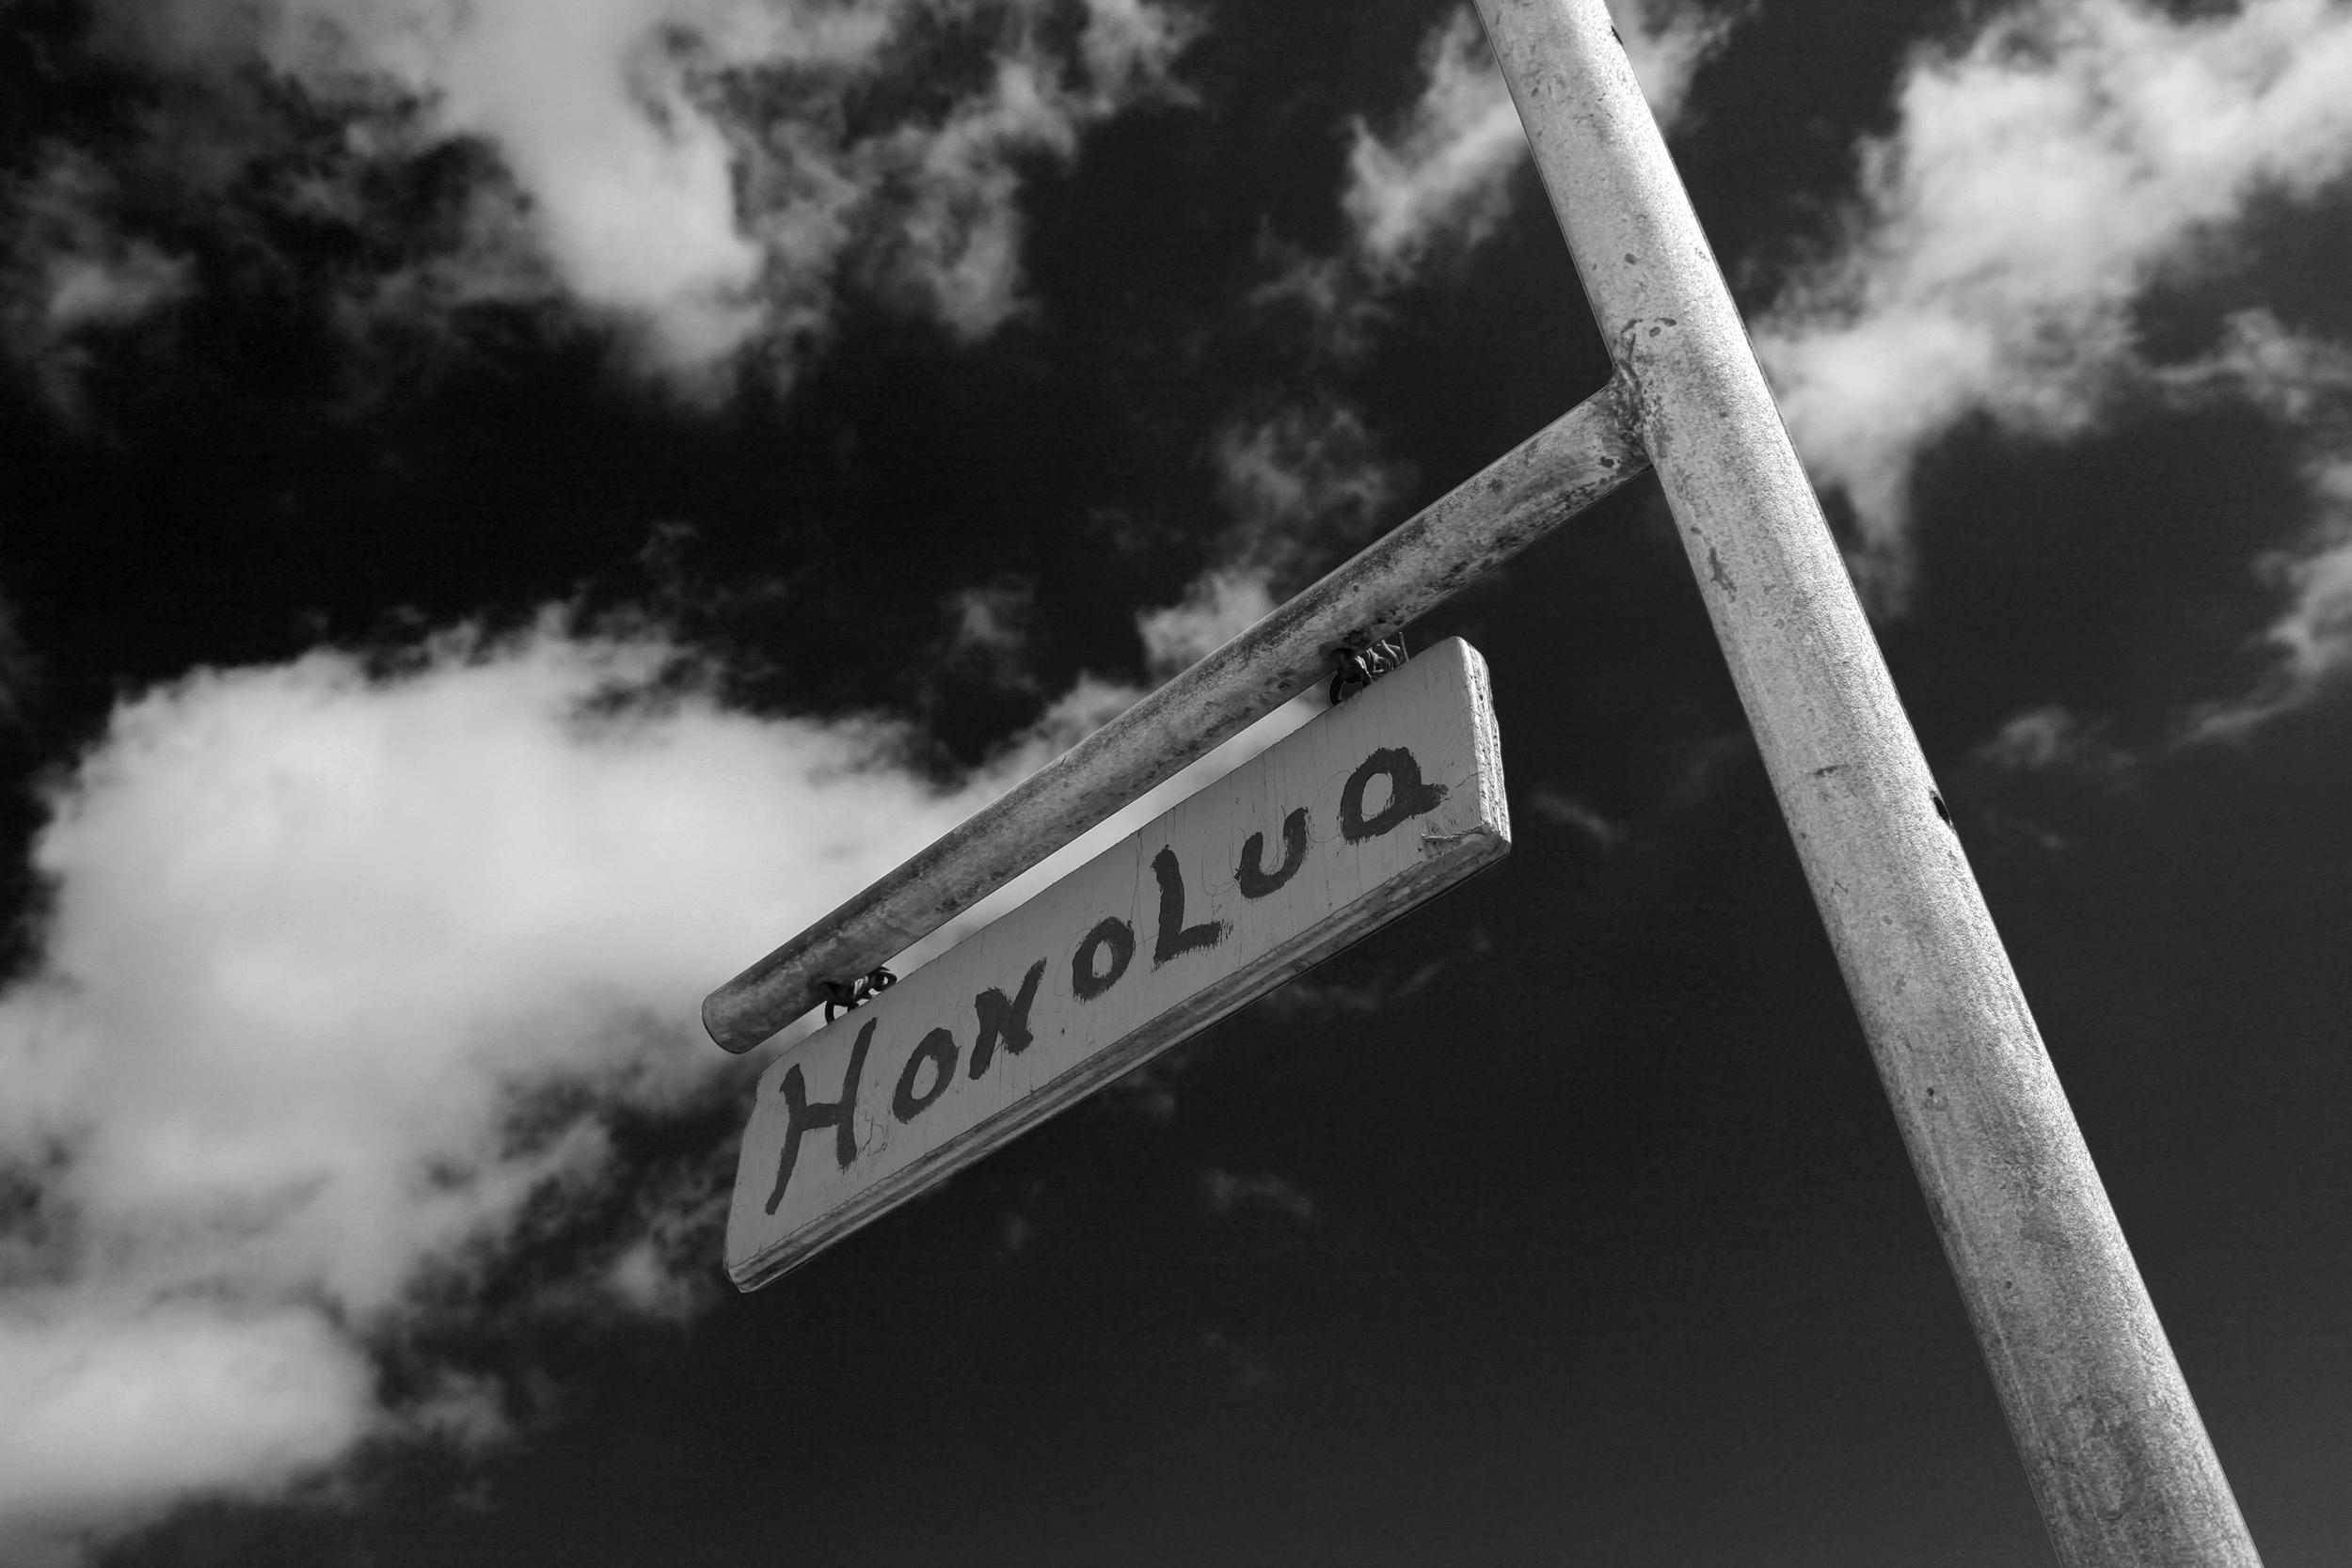 Hololua Clouds